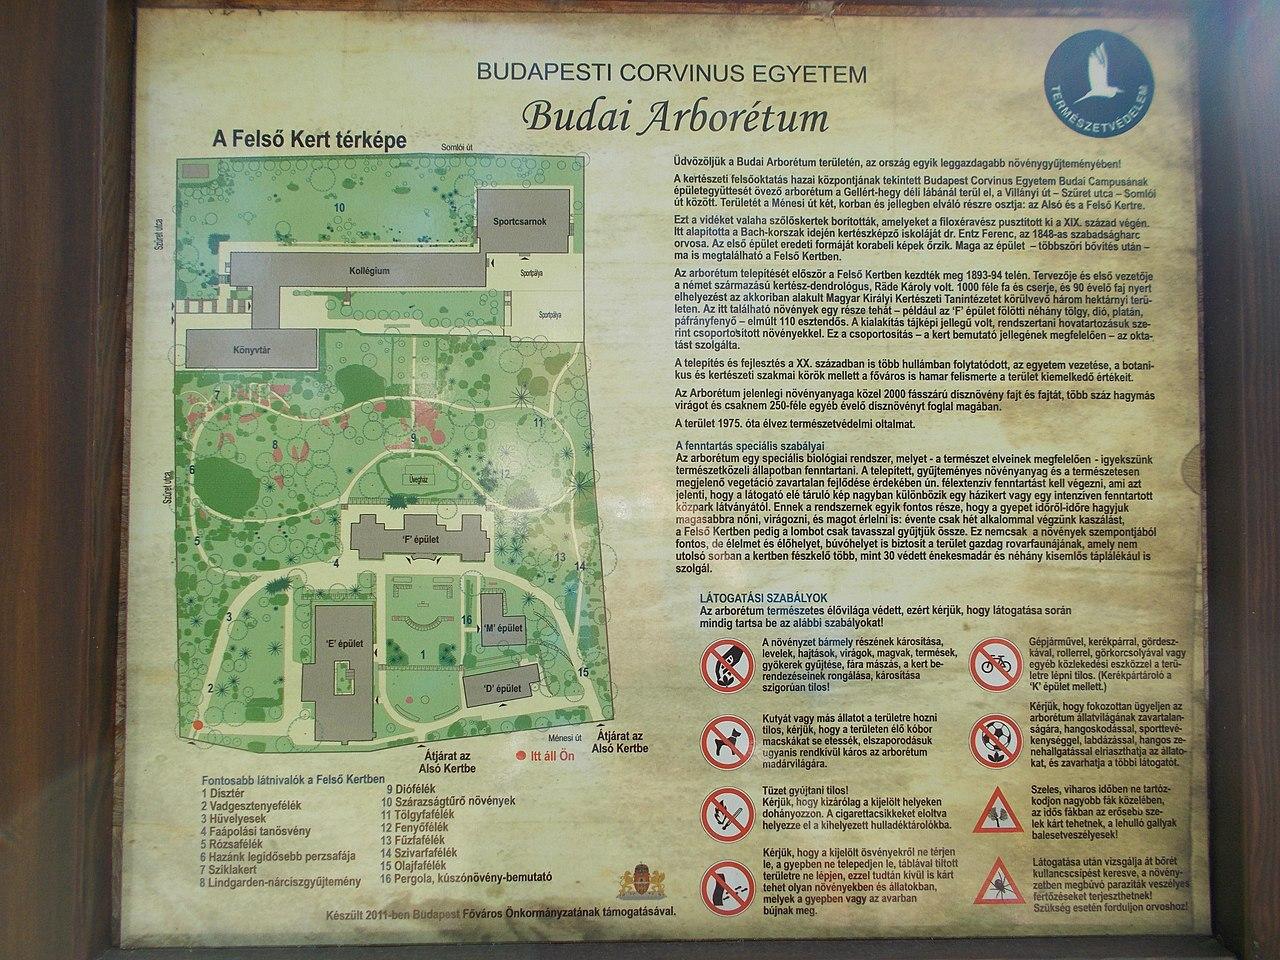 File Budai Arboretum Felso Kert Ismerteto Budapest Xi